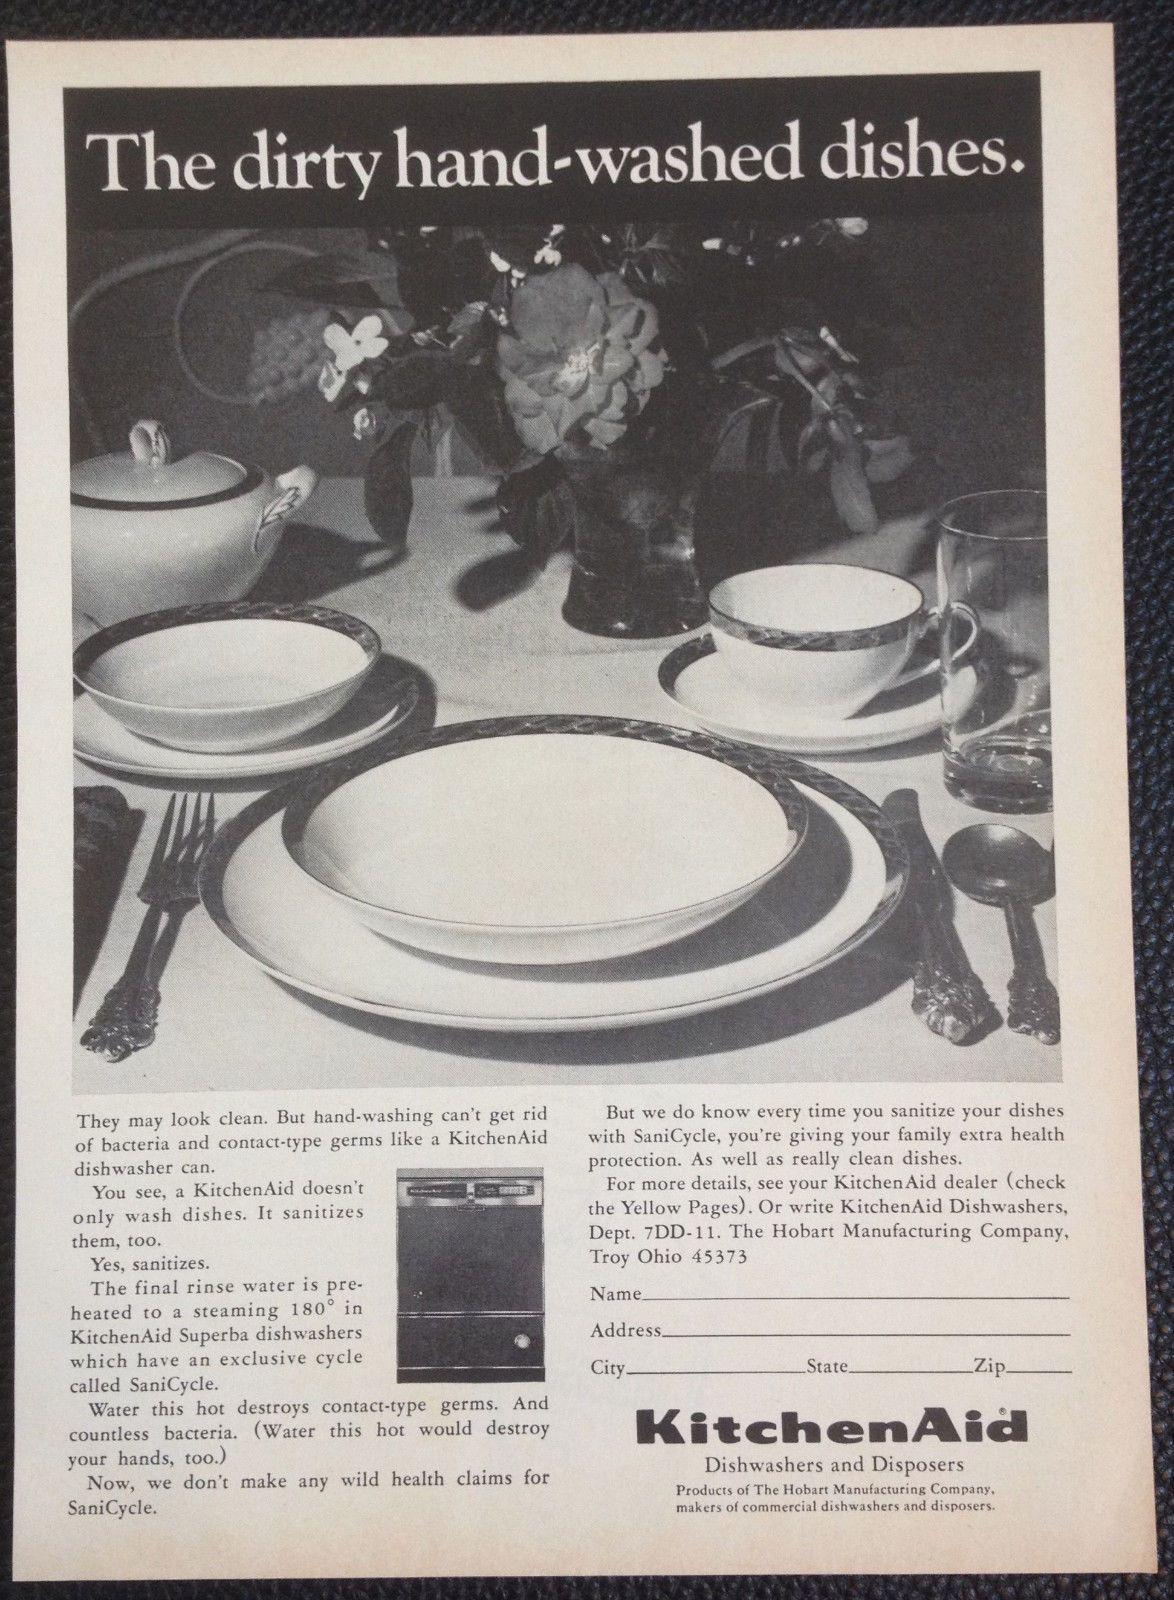 Vintage 1967 KitchenAid Dishwashers and Disposers Magazine Ad ...